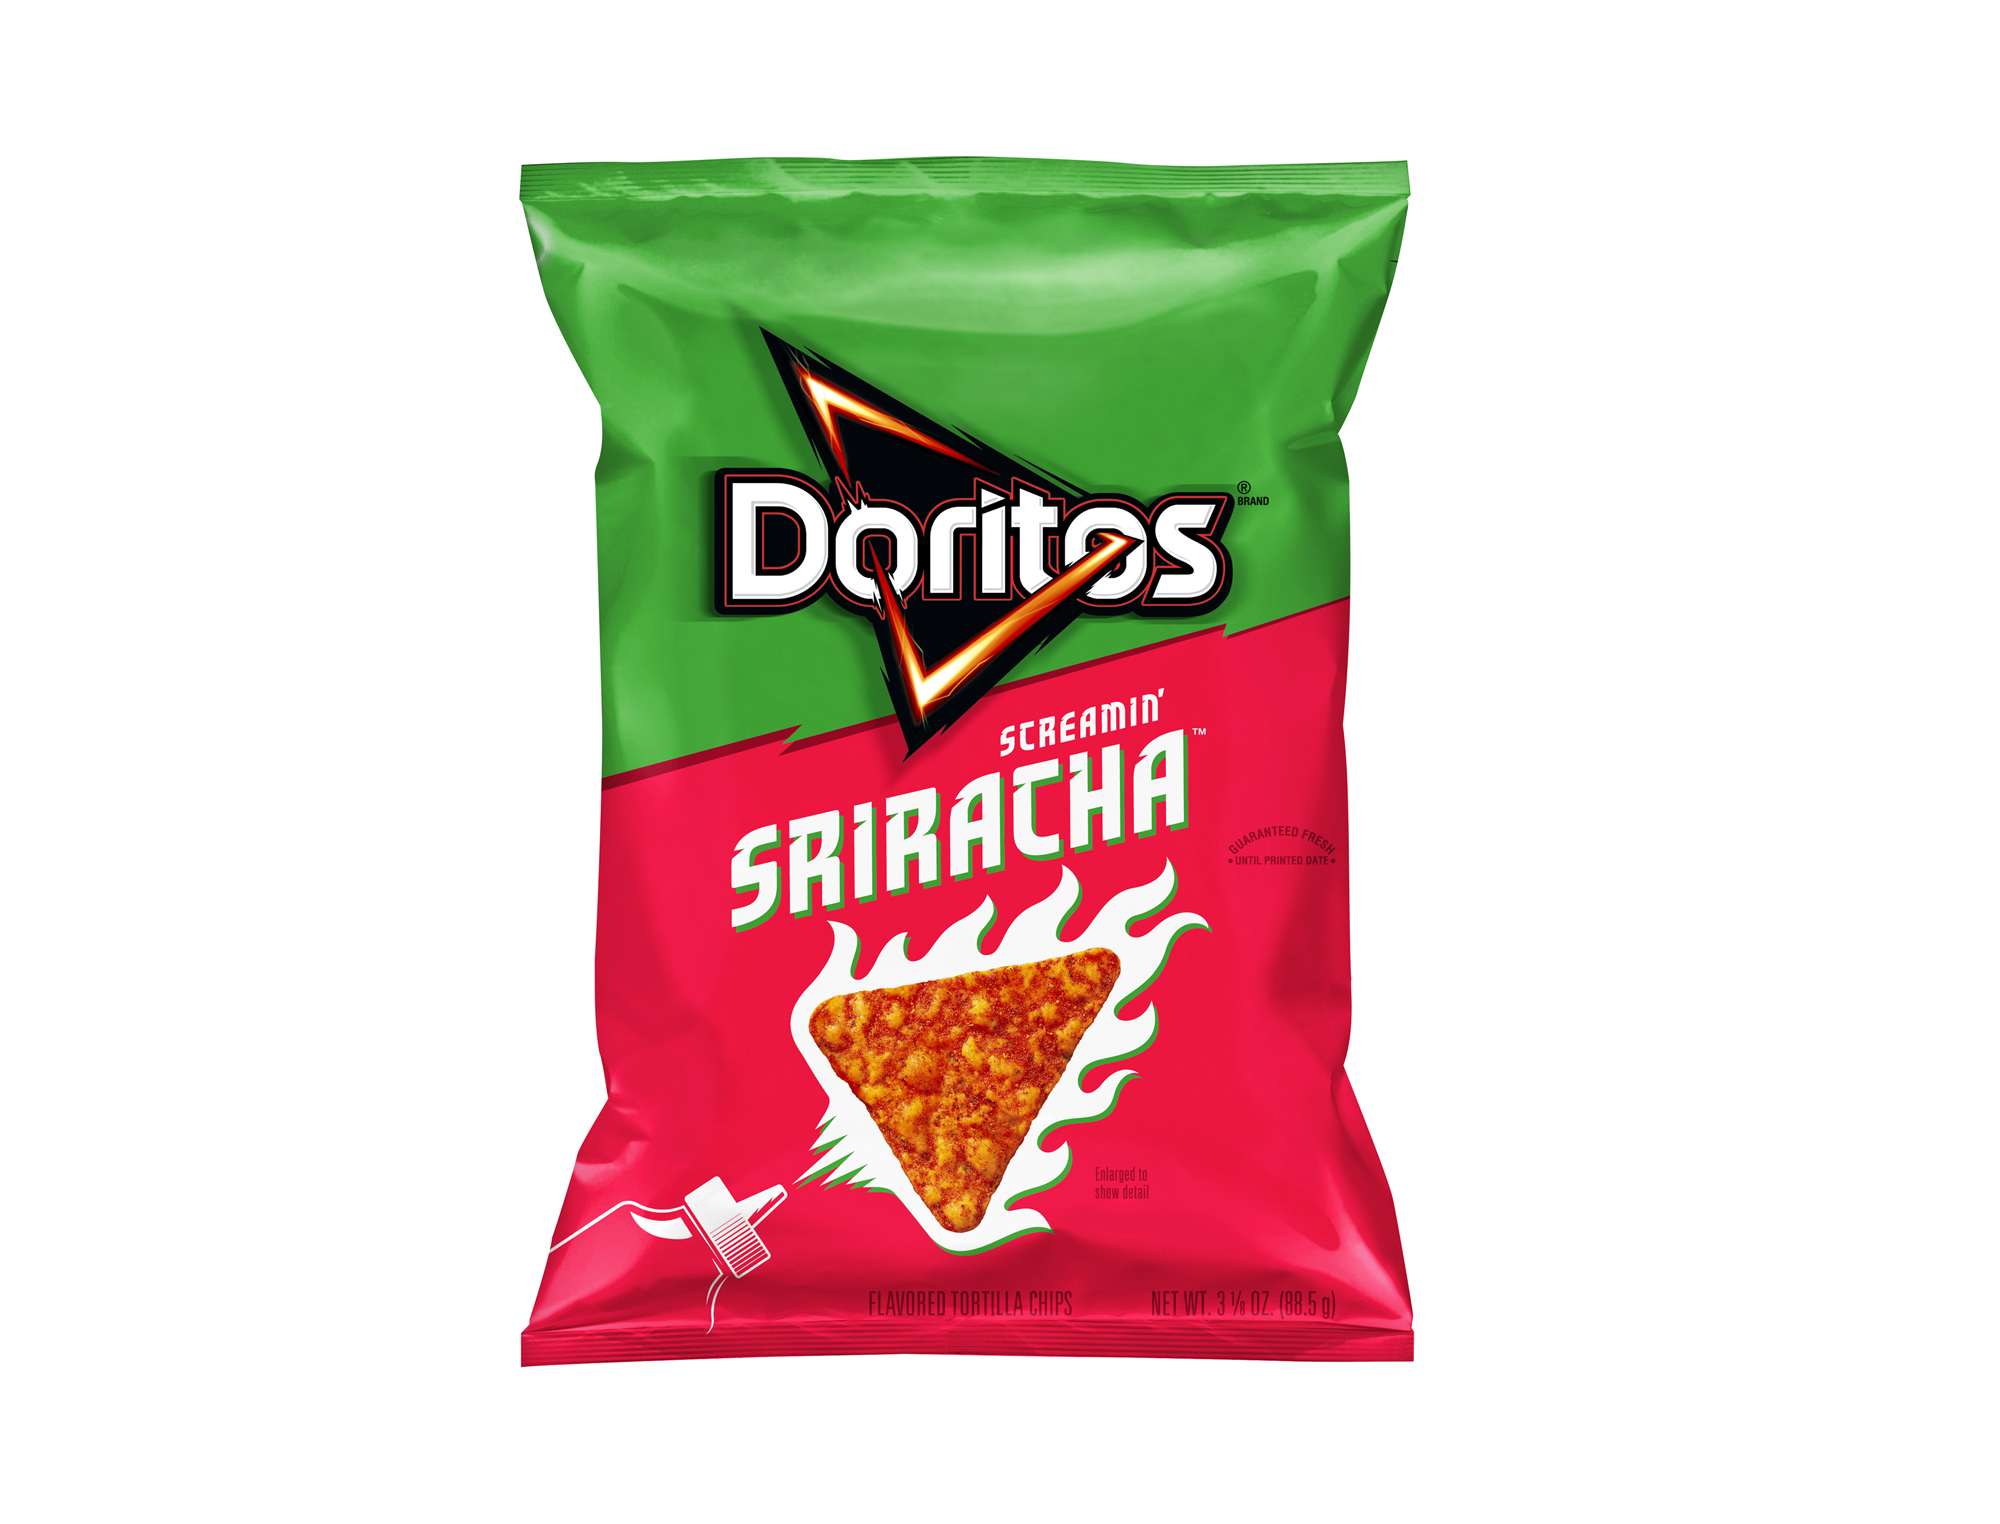 Doritos-Screamin-Sriracha